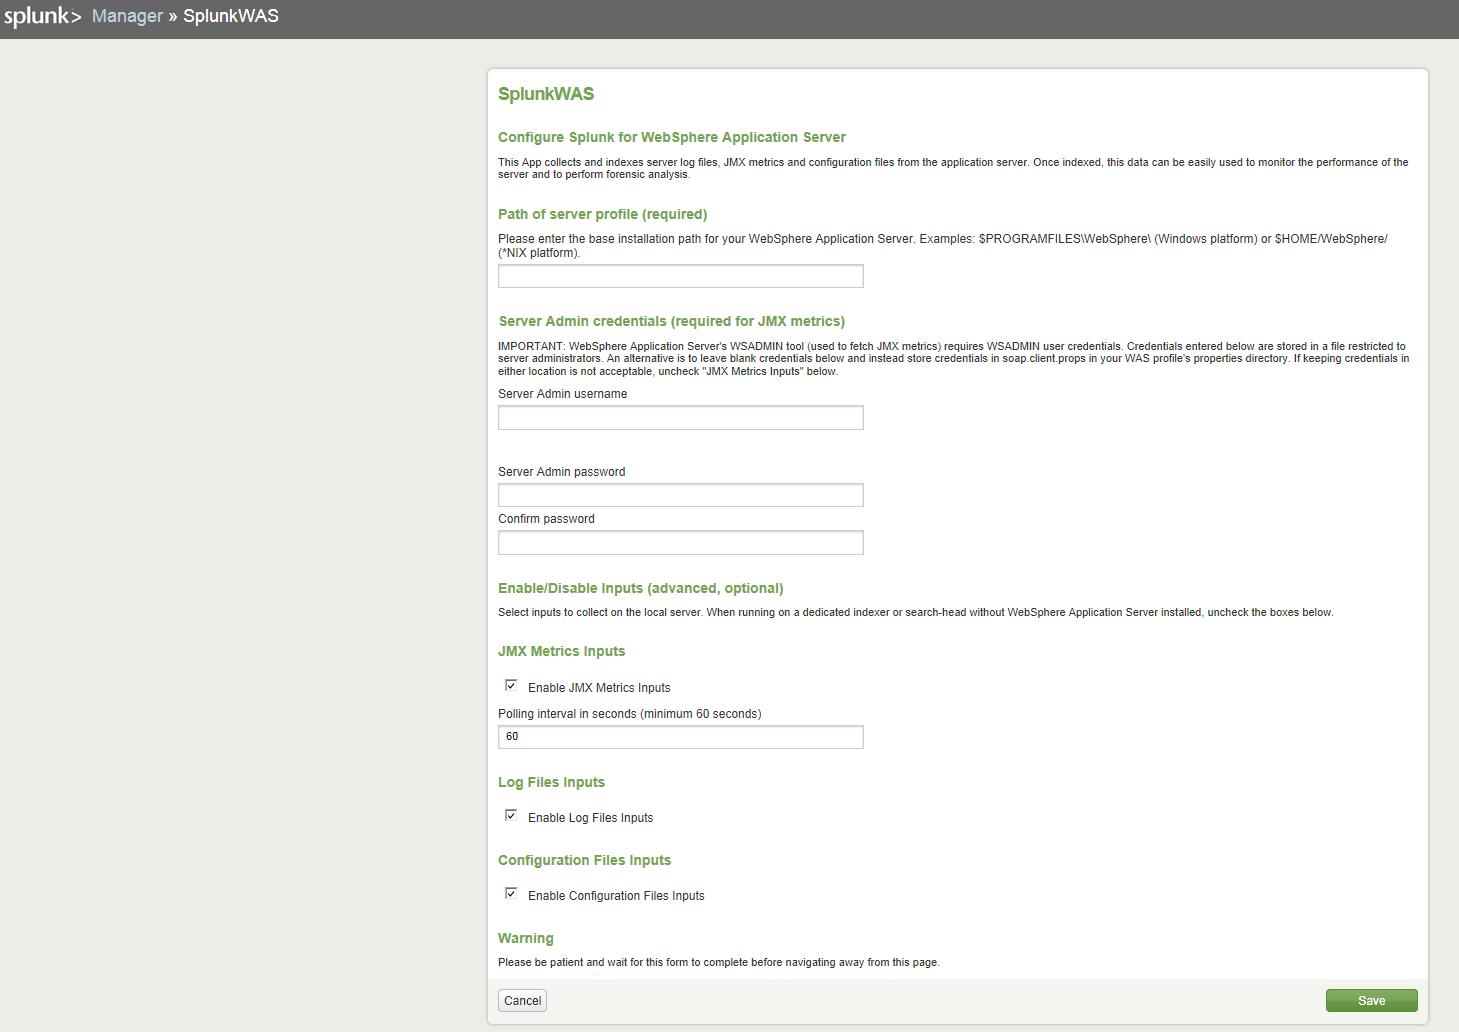 Siva R Vaka: Splunk for Websphere Application Server